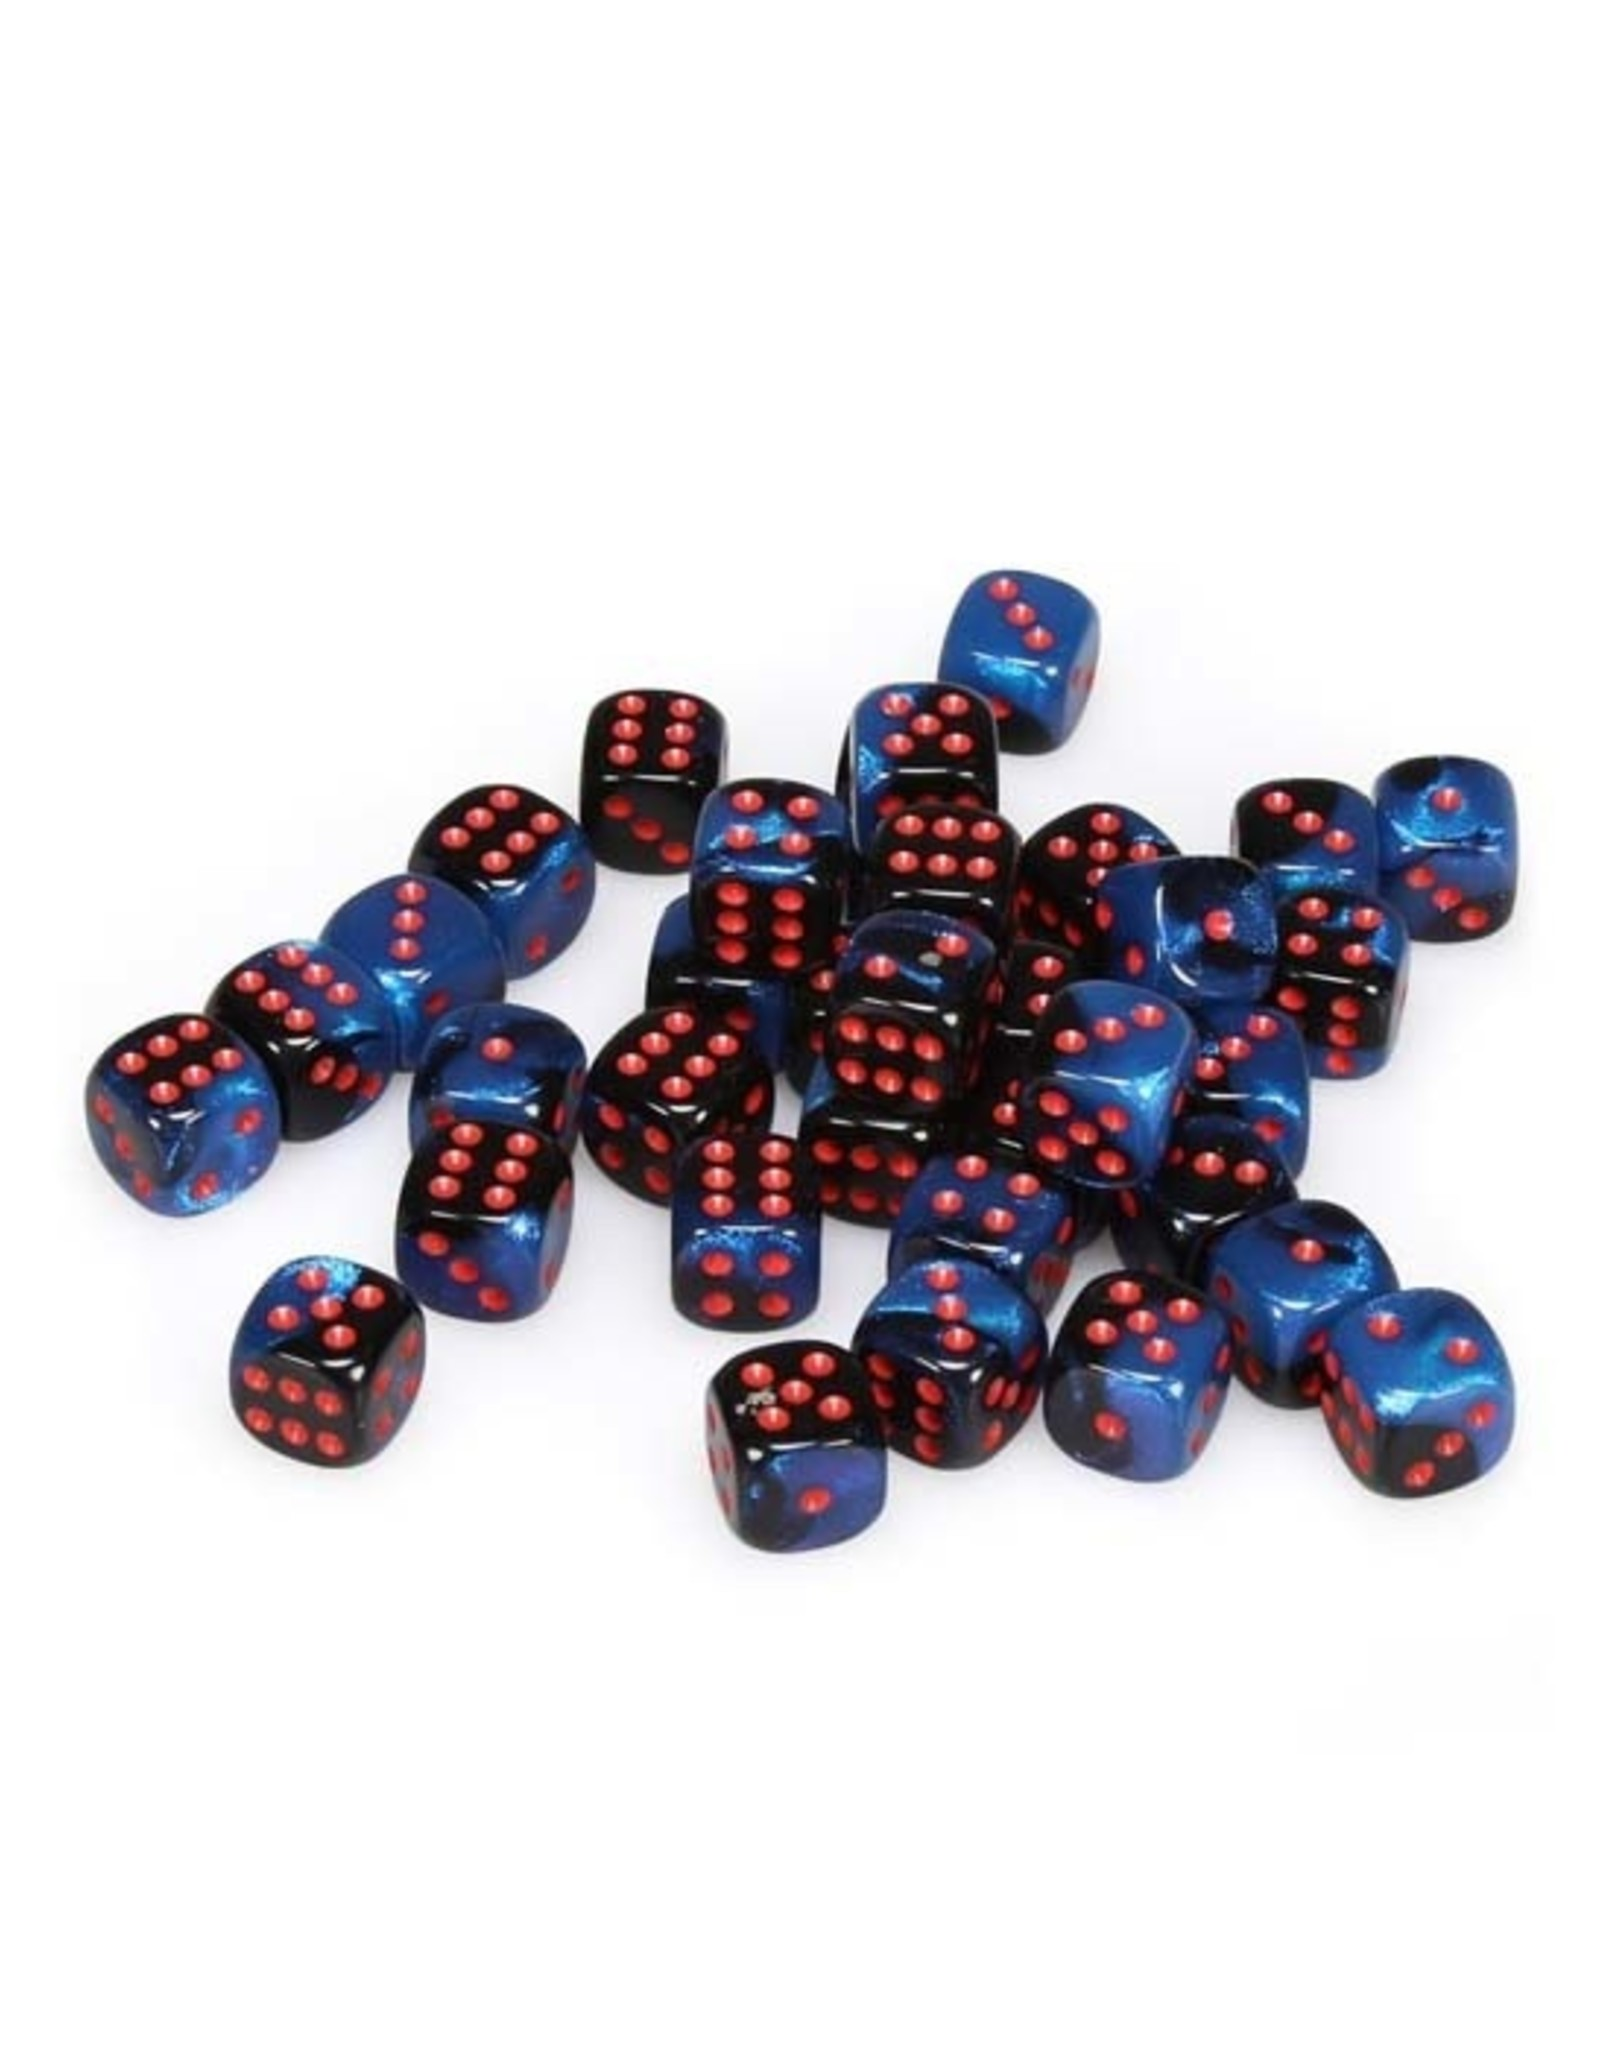 Chessex Chessex: 12mm D6 - Gemini - Black Starlight w/ Red